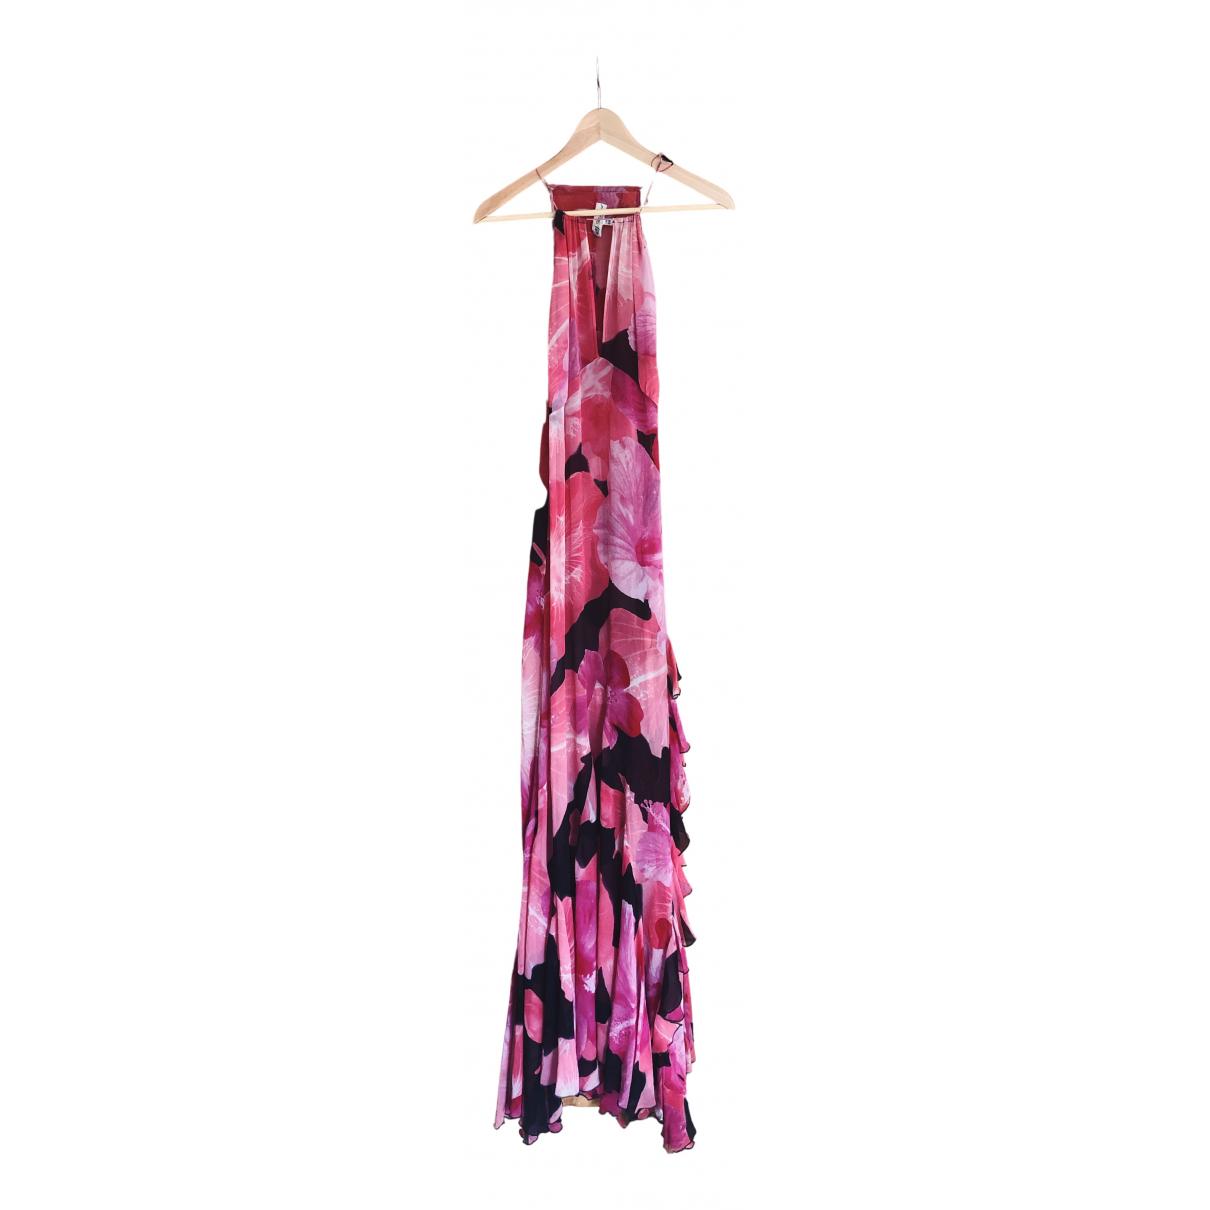 Blumarine \N Pink Silk dress for Women 44 IT